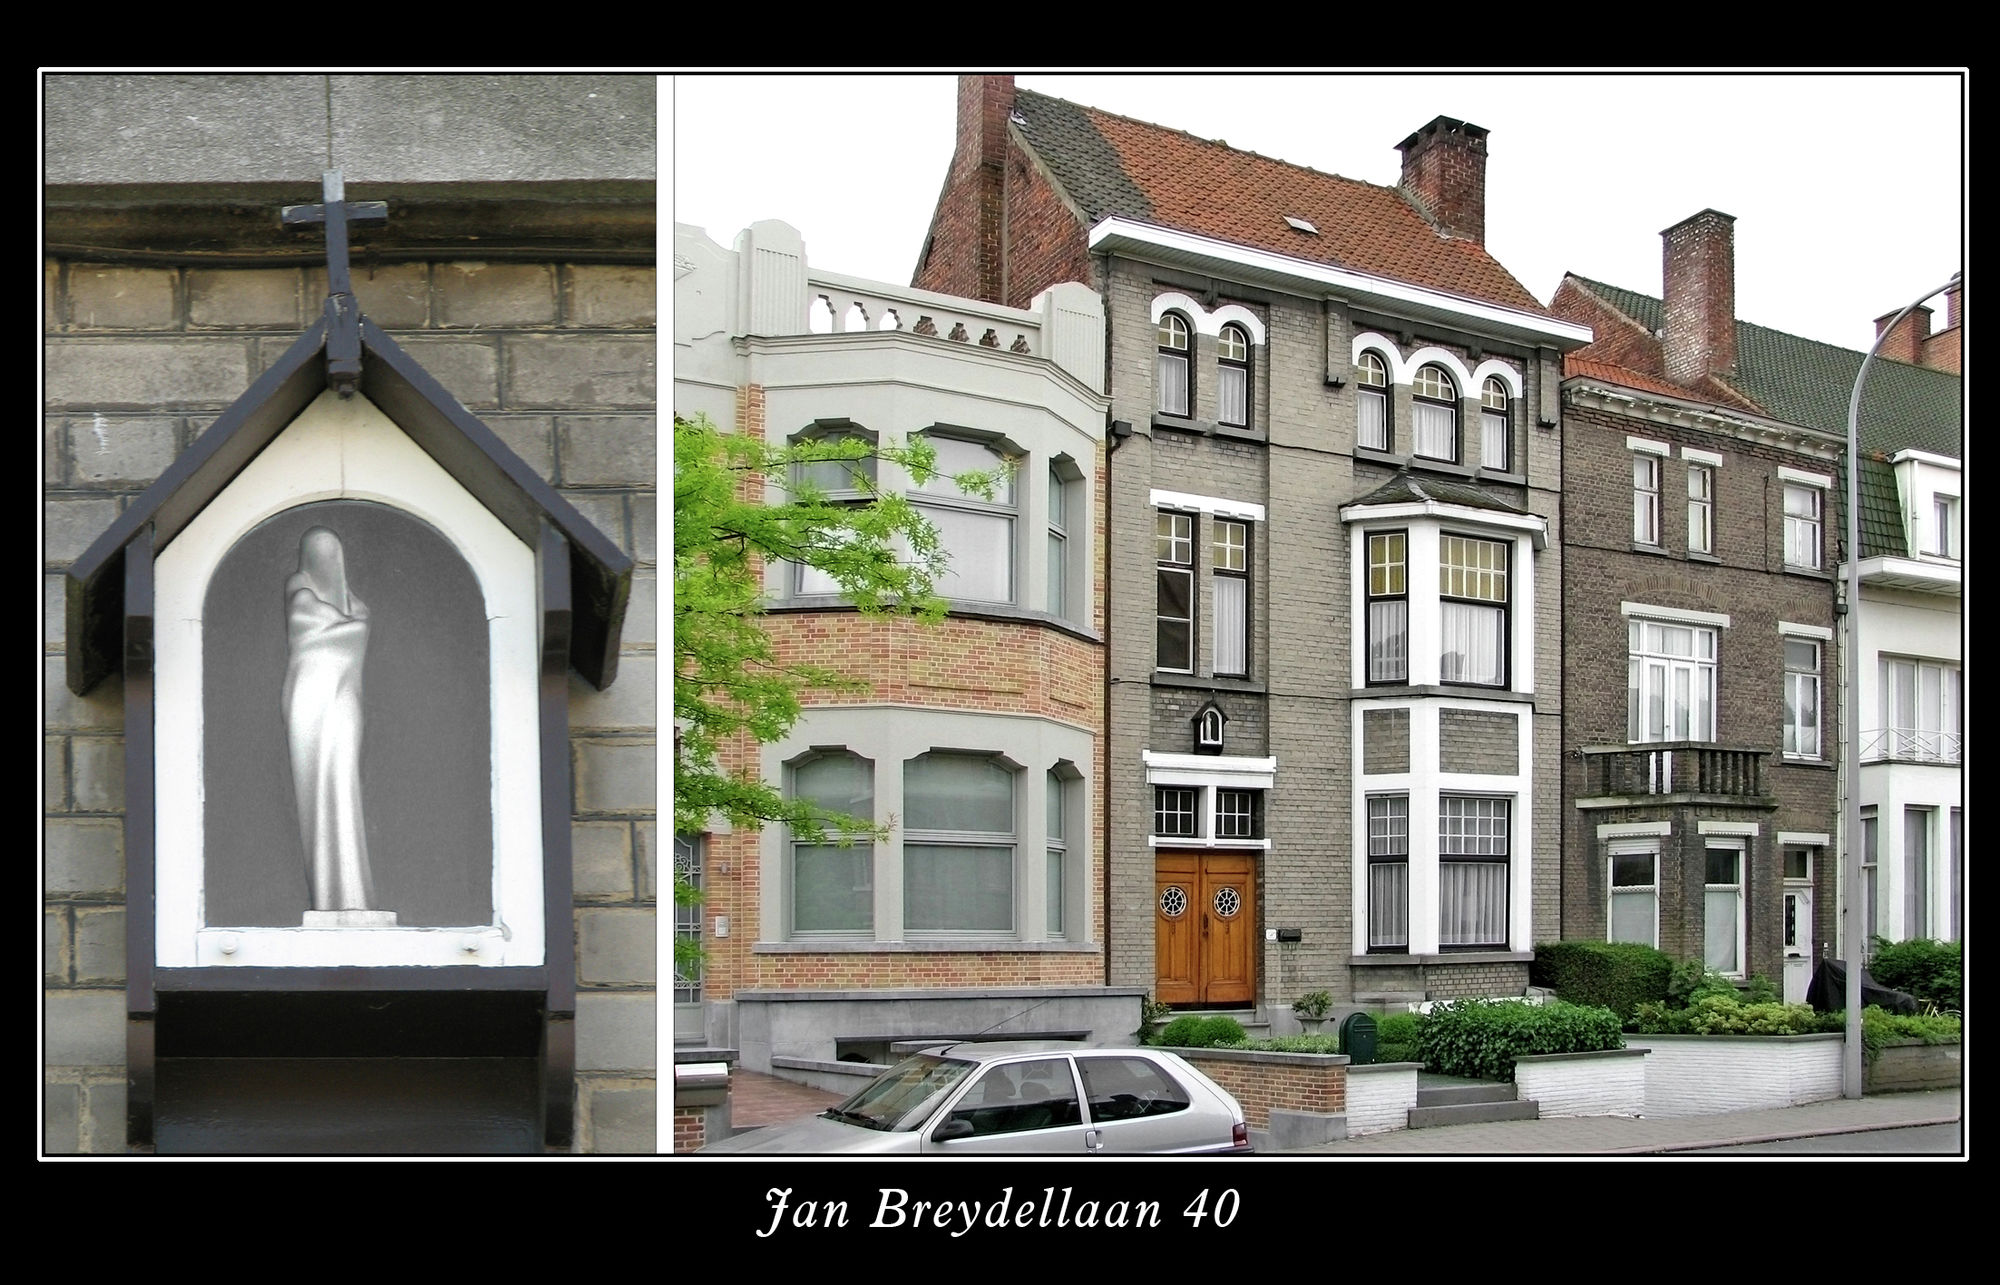 Jan Breydellaan